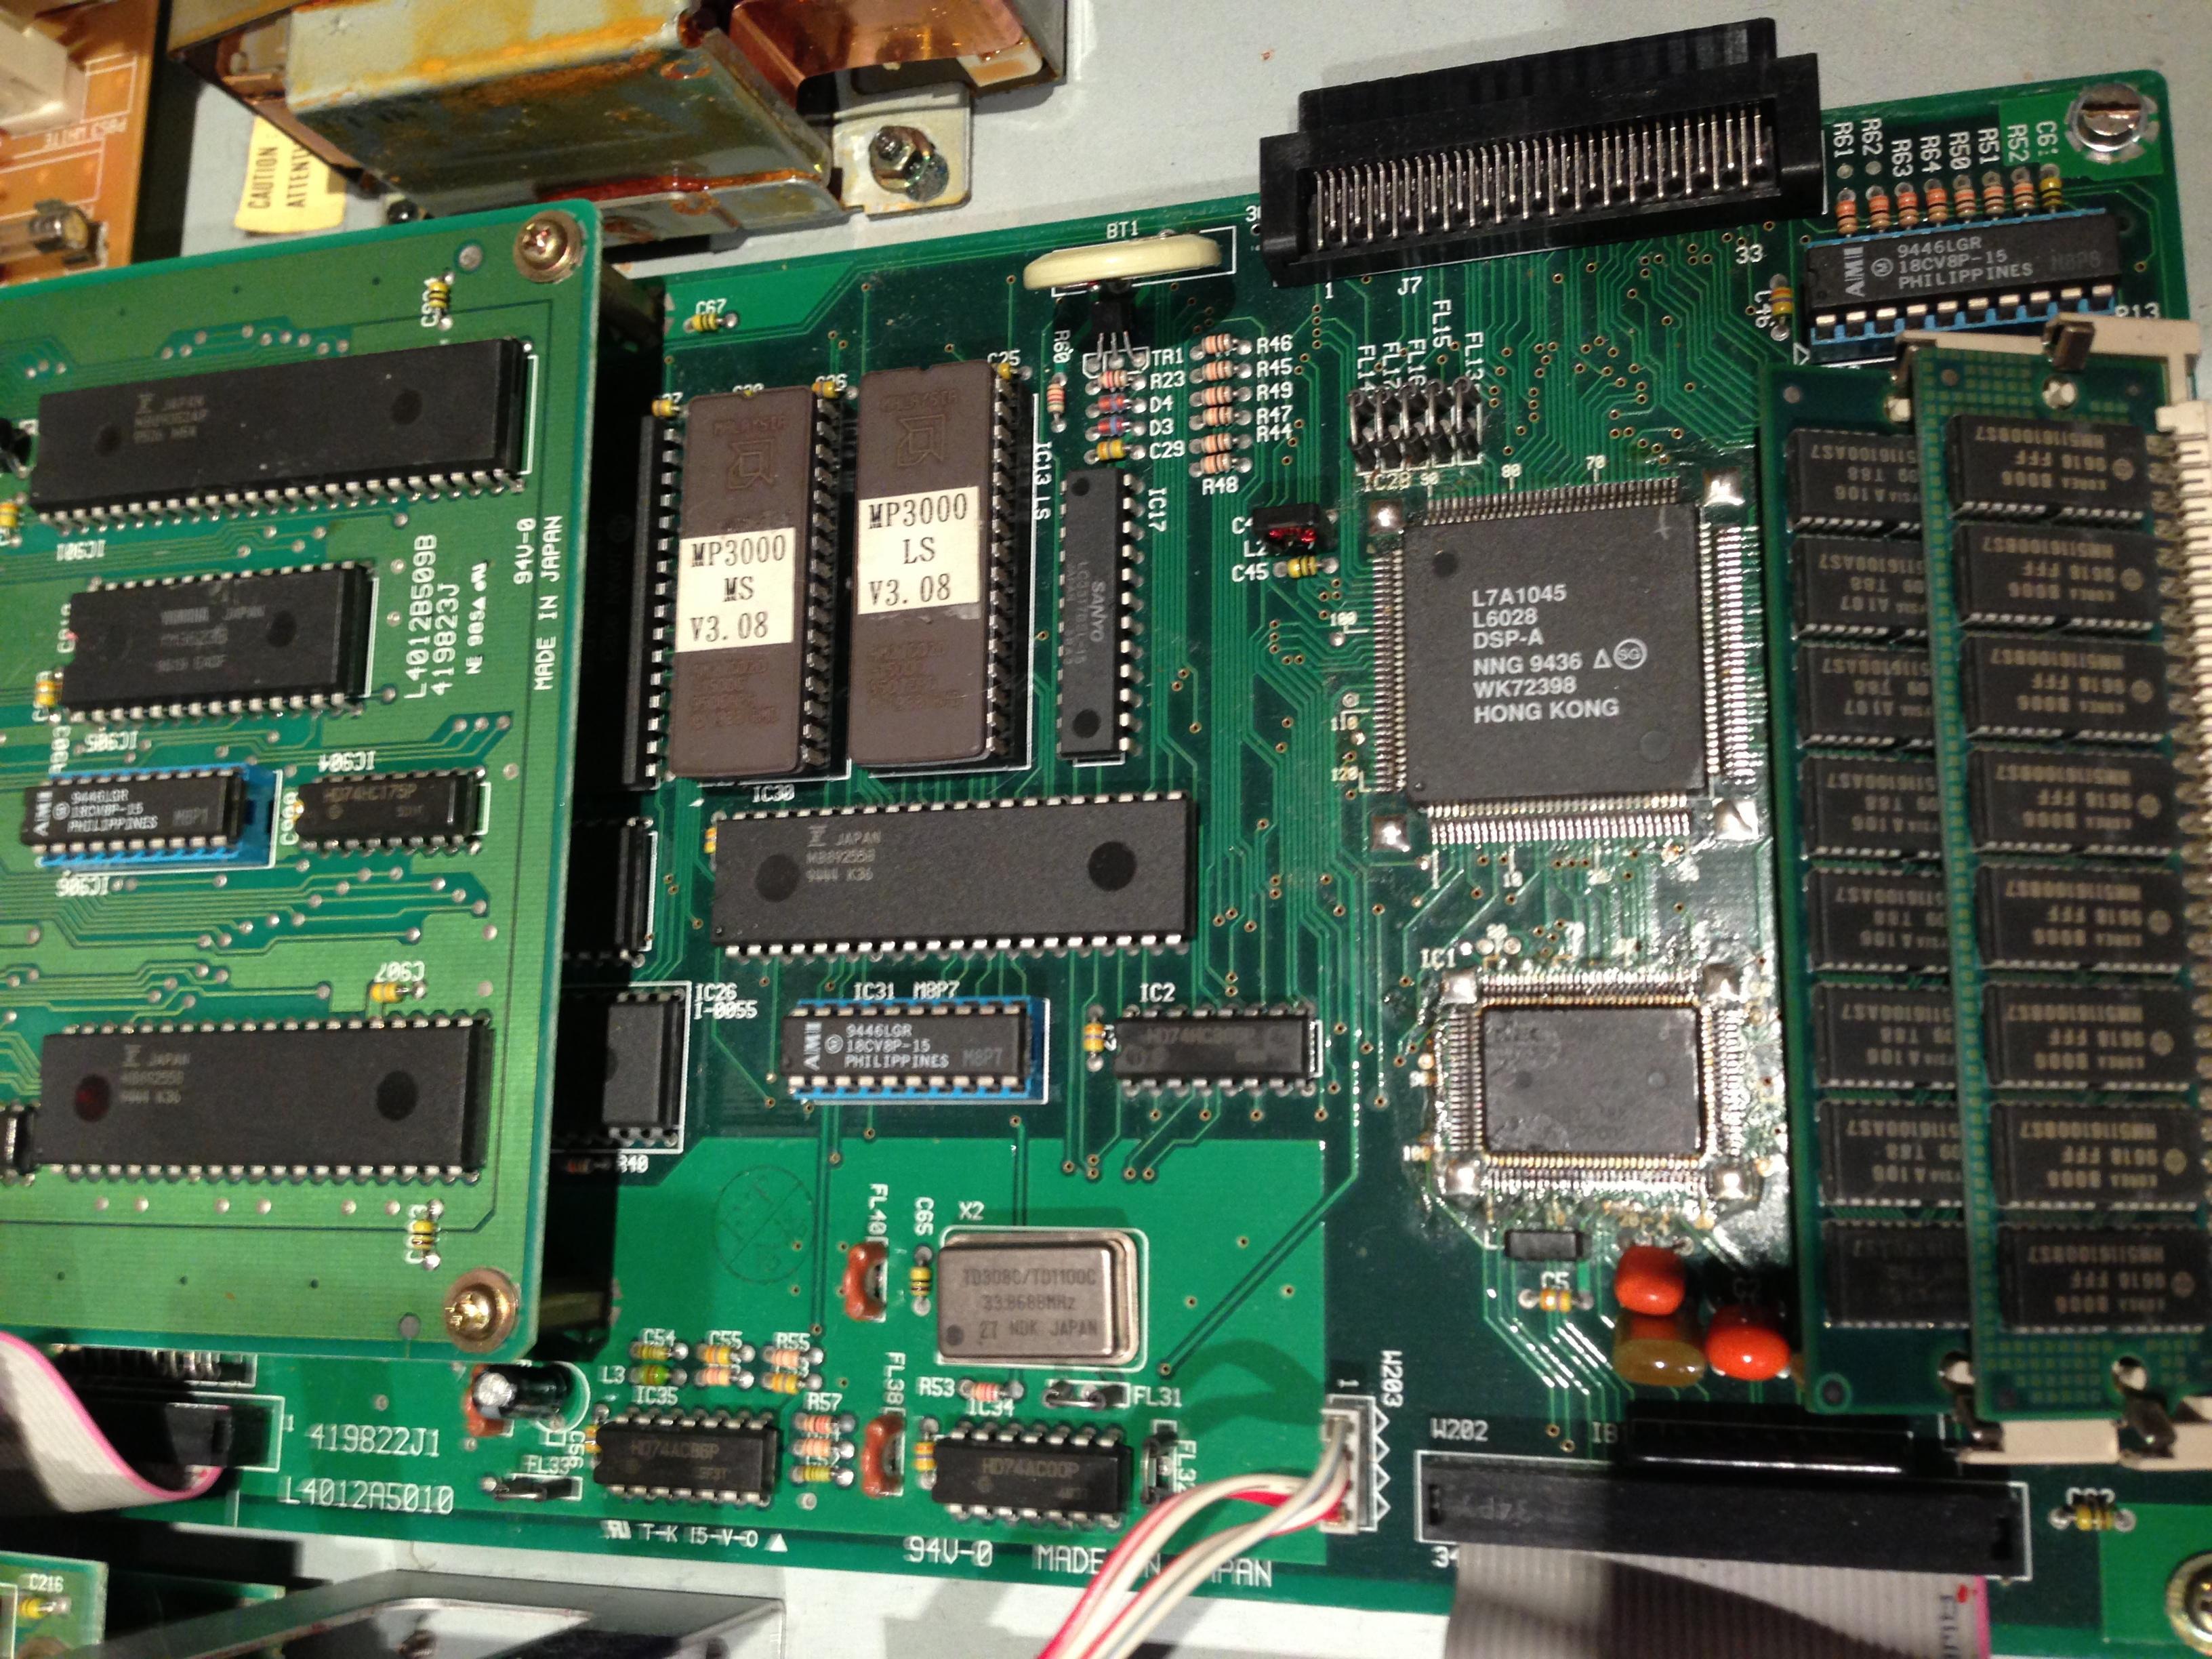 Akai Mpc3000 Obsoletetechnology